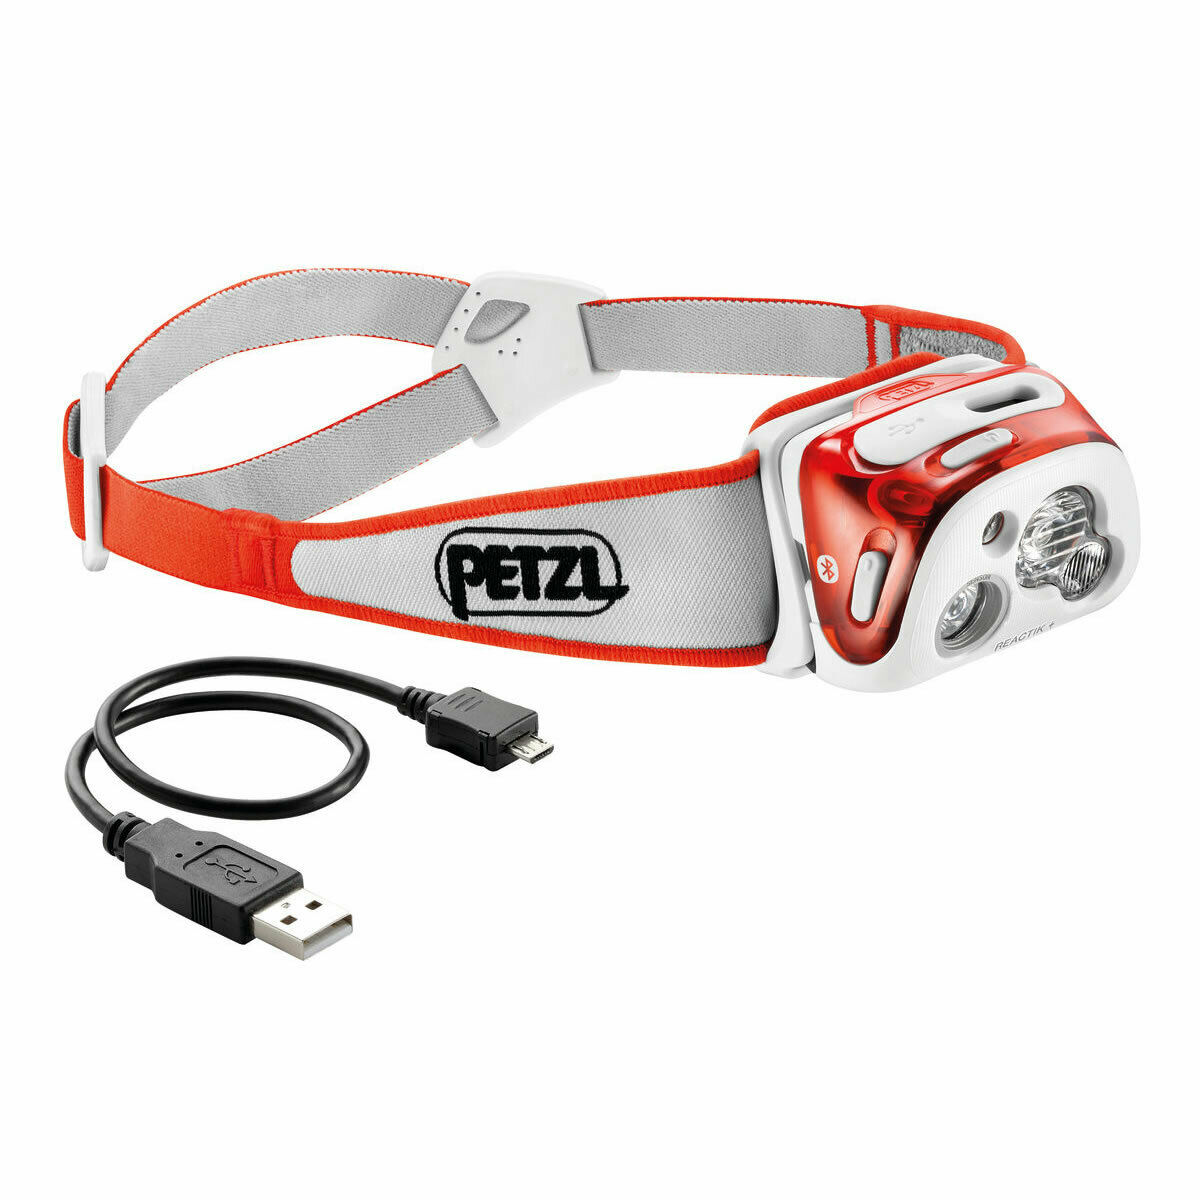 PETZL E95 REACTIK  Plus 300 luuomini Reactive Lighting blutooth Coral NO scatola